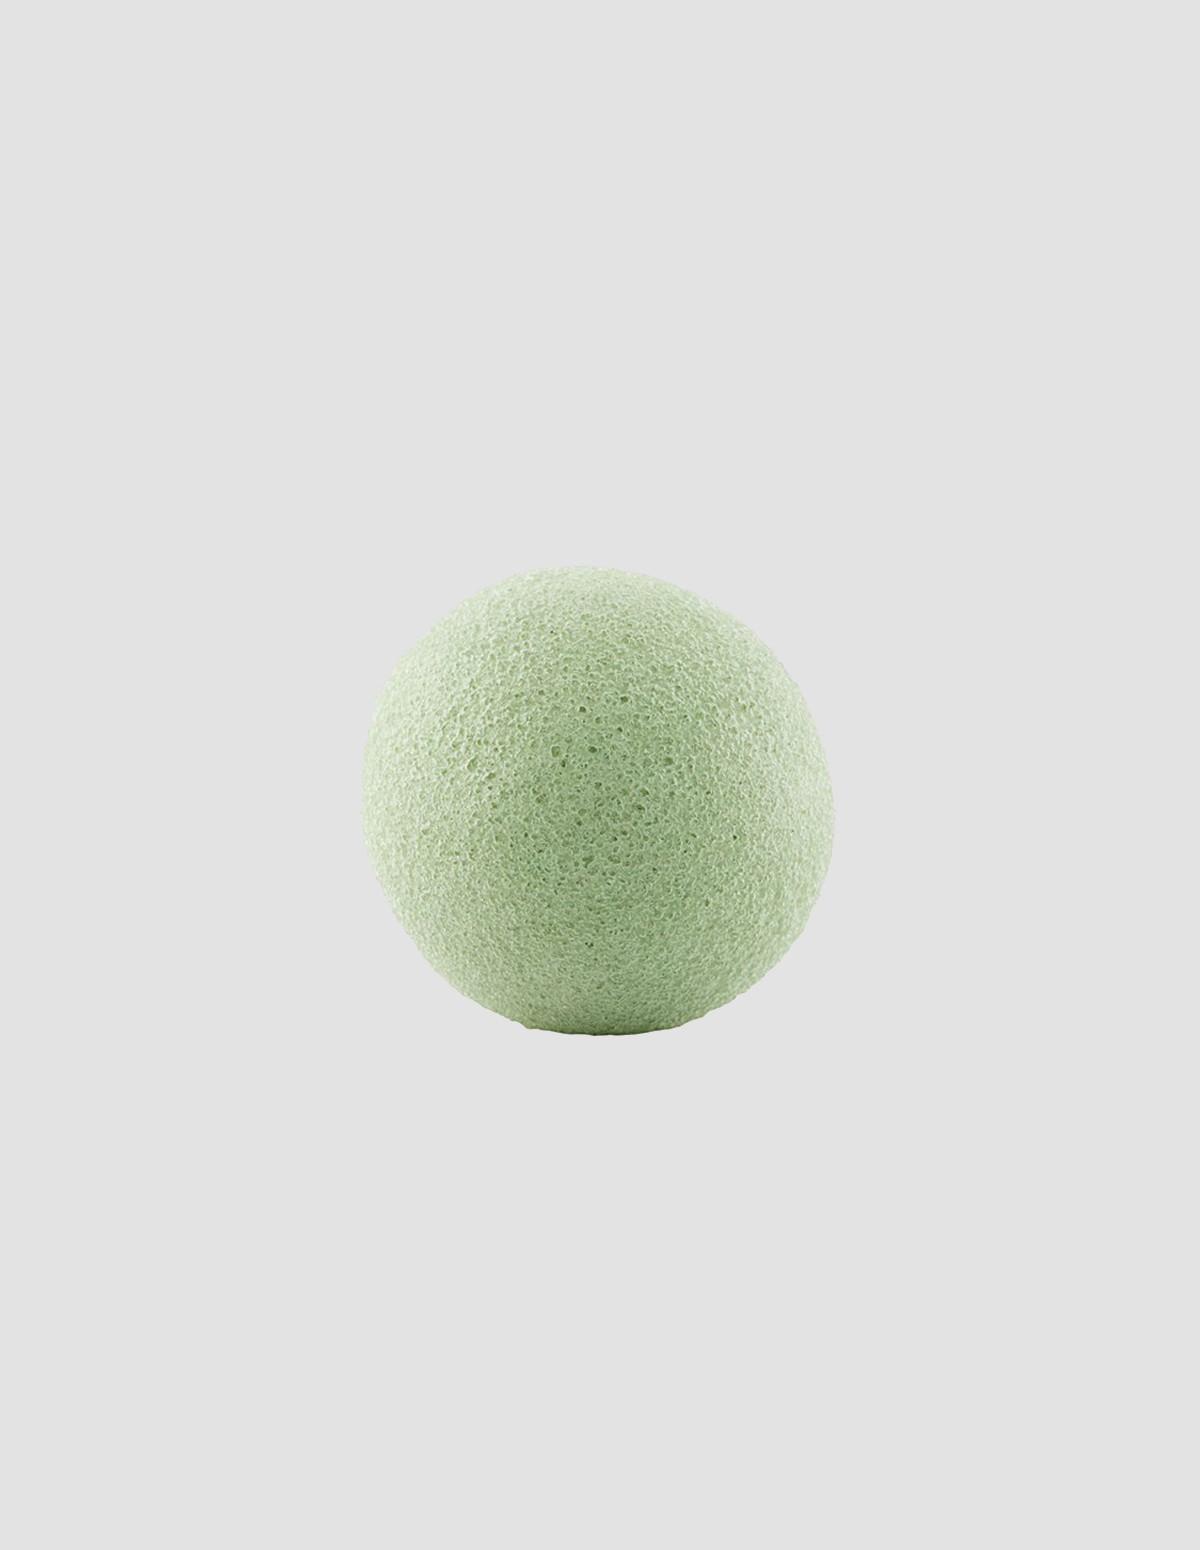 Meraki Konjac Sponge Green Tea - GREEN TEA